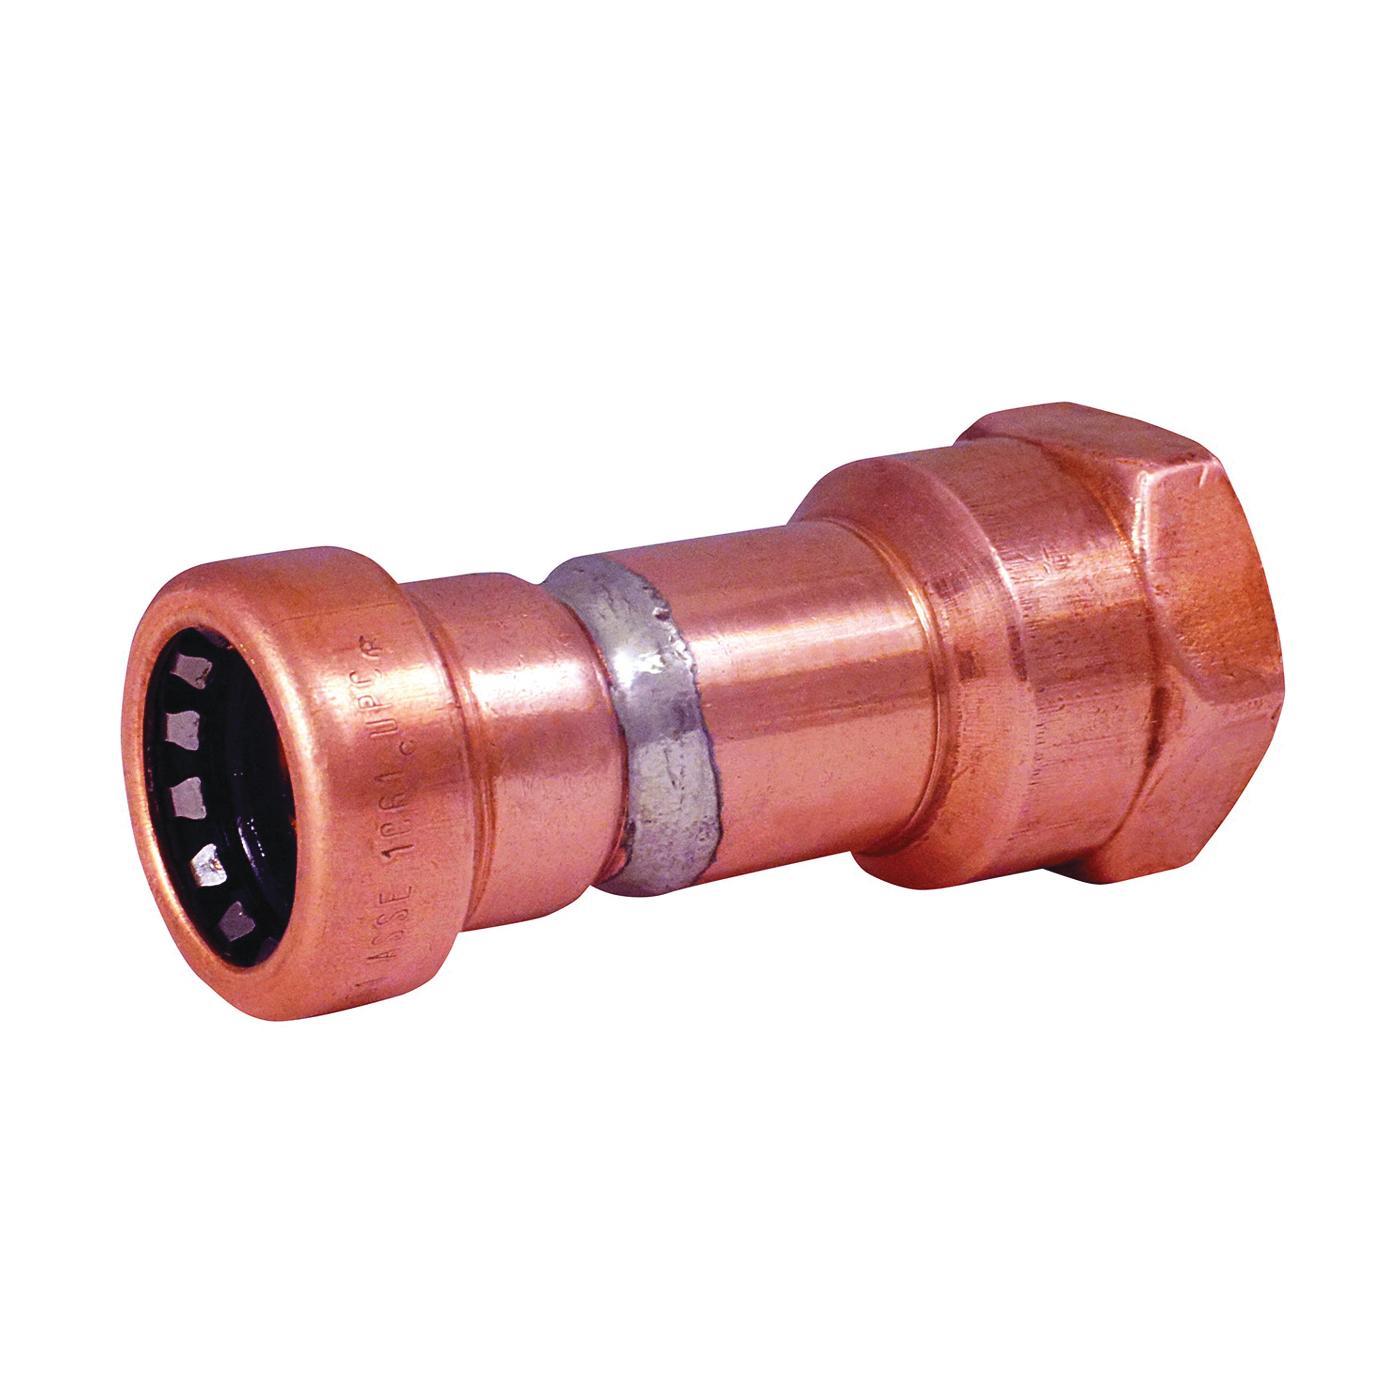 Picture of EPC 903 10170730 Push-Fit Adapter, 1/2 in, Sweat x Female, Copper, 200 psi Pressure